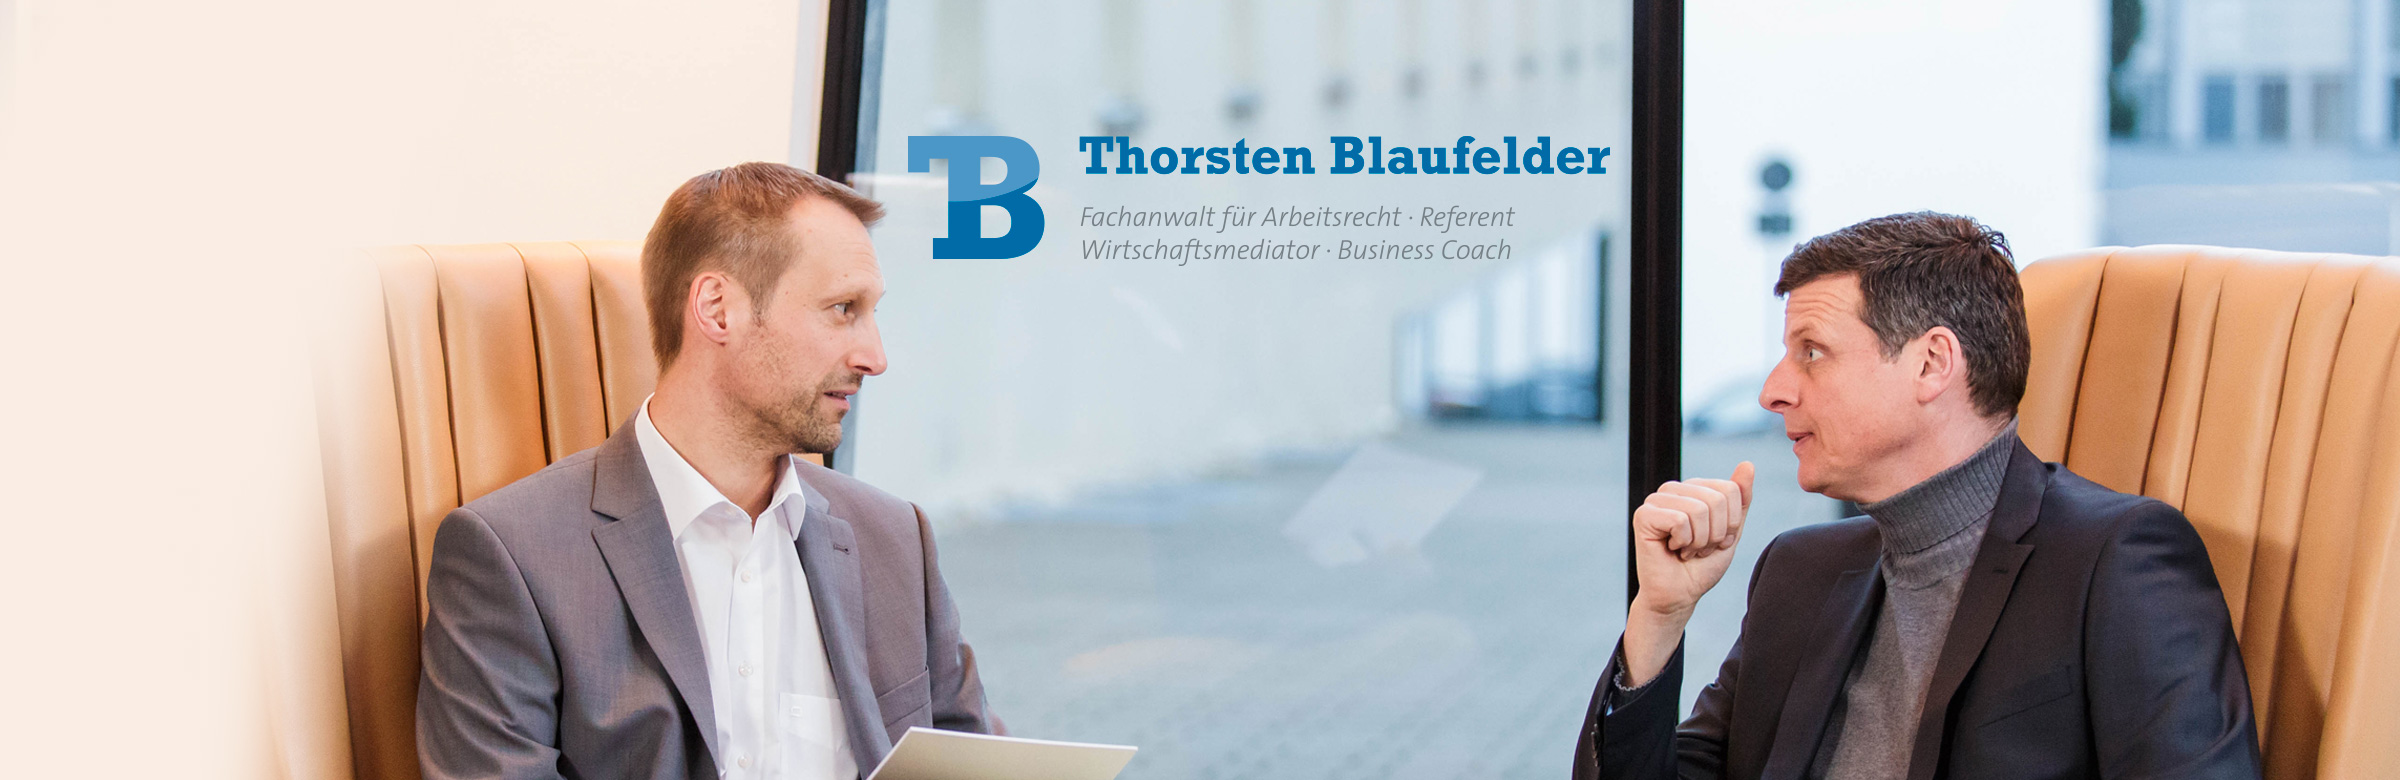 Thorsten Blaufelder - Termine